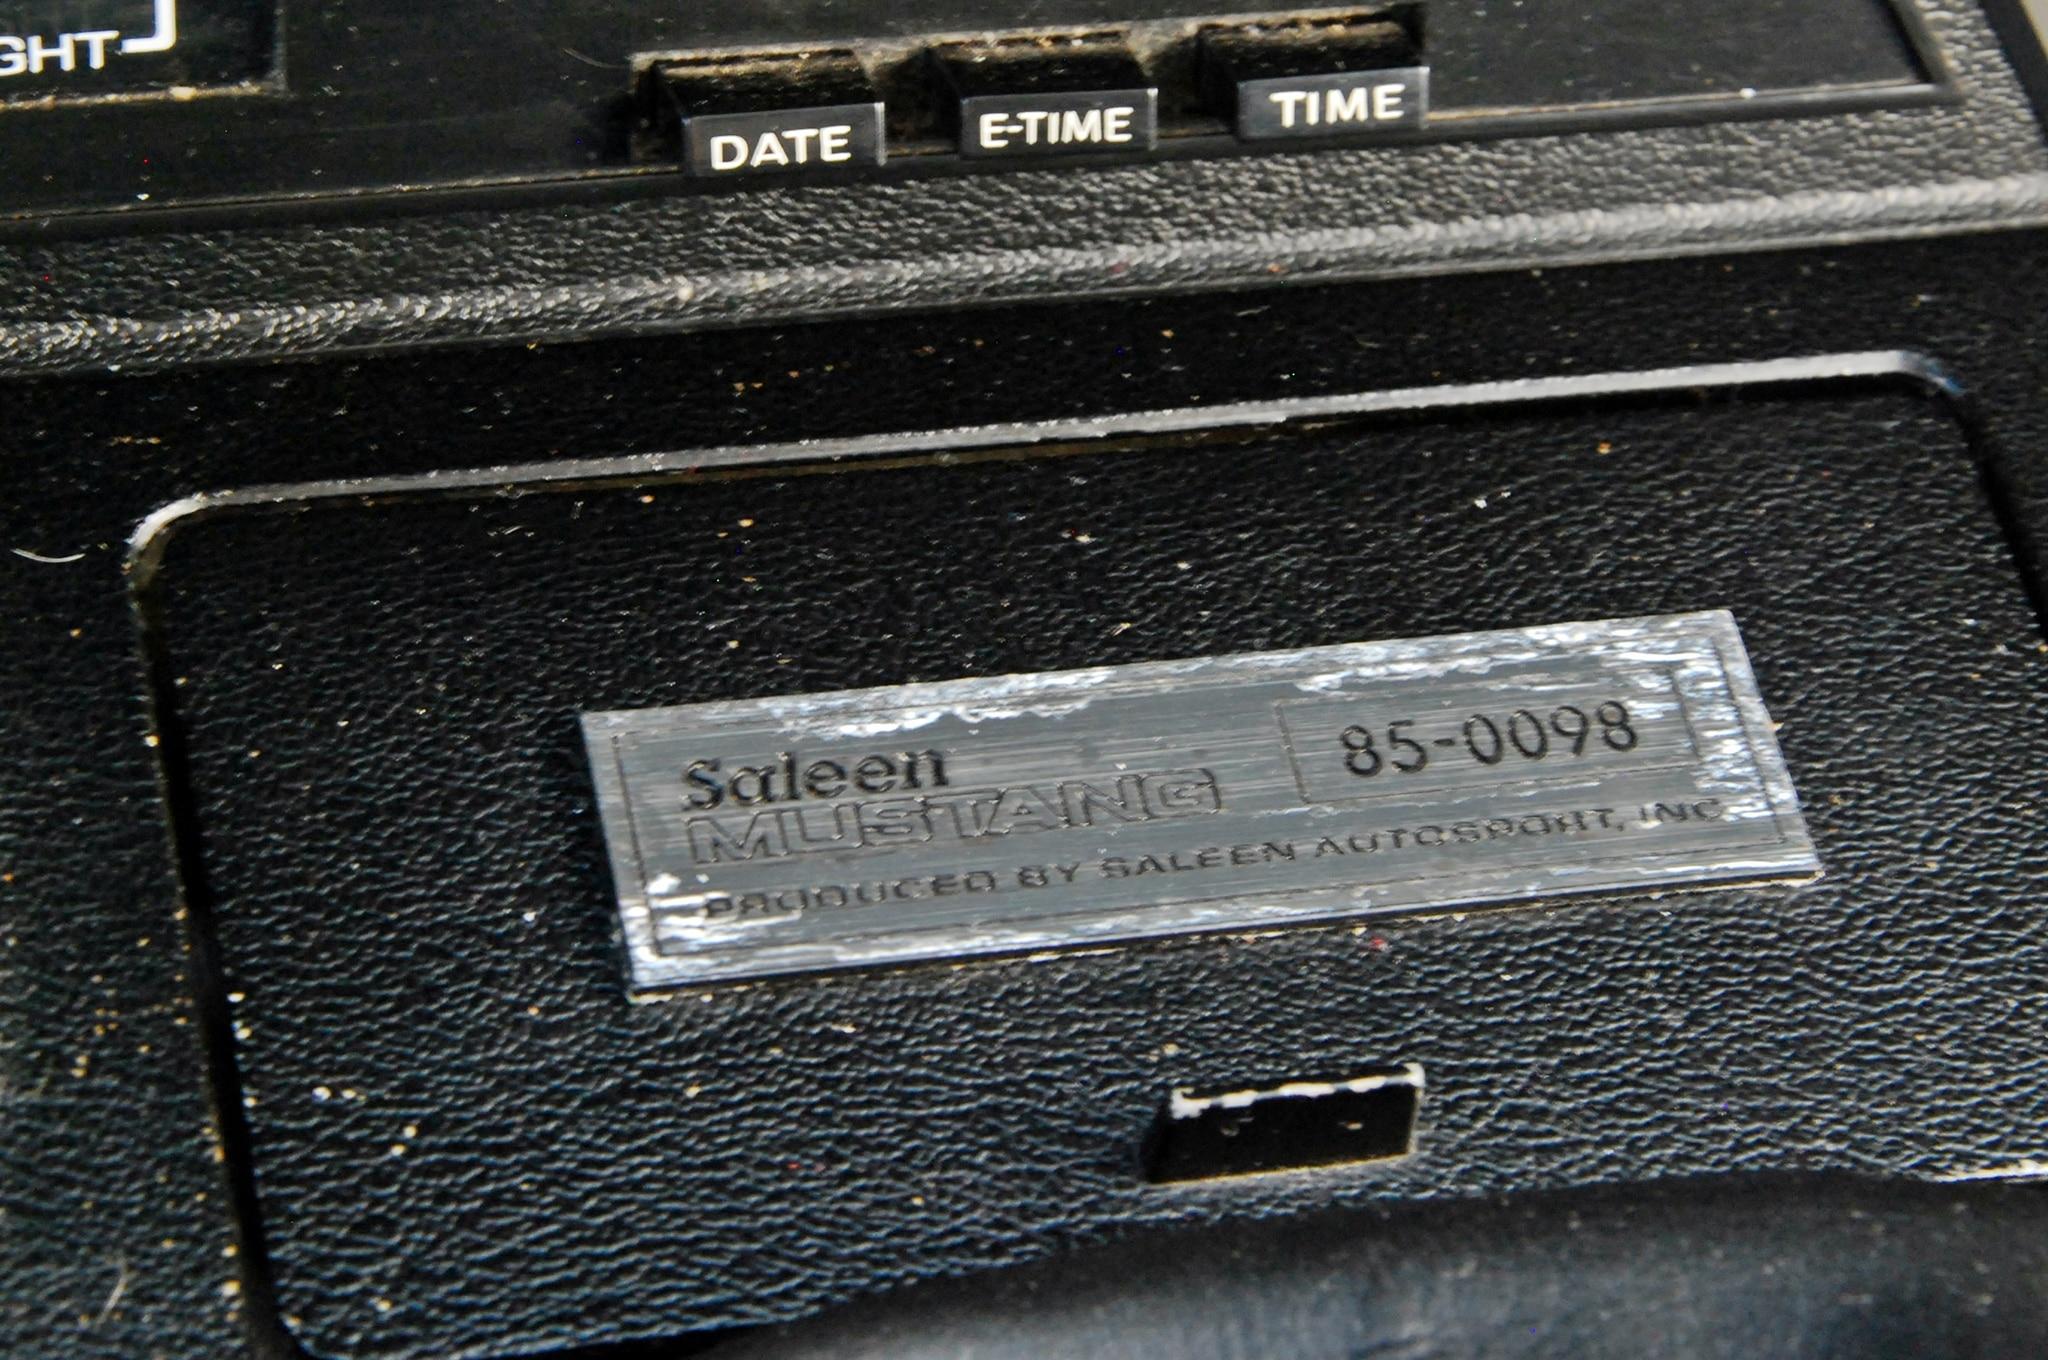 09 1985 Saleen Mustang Id Plate